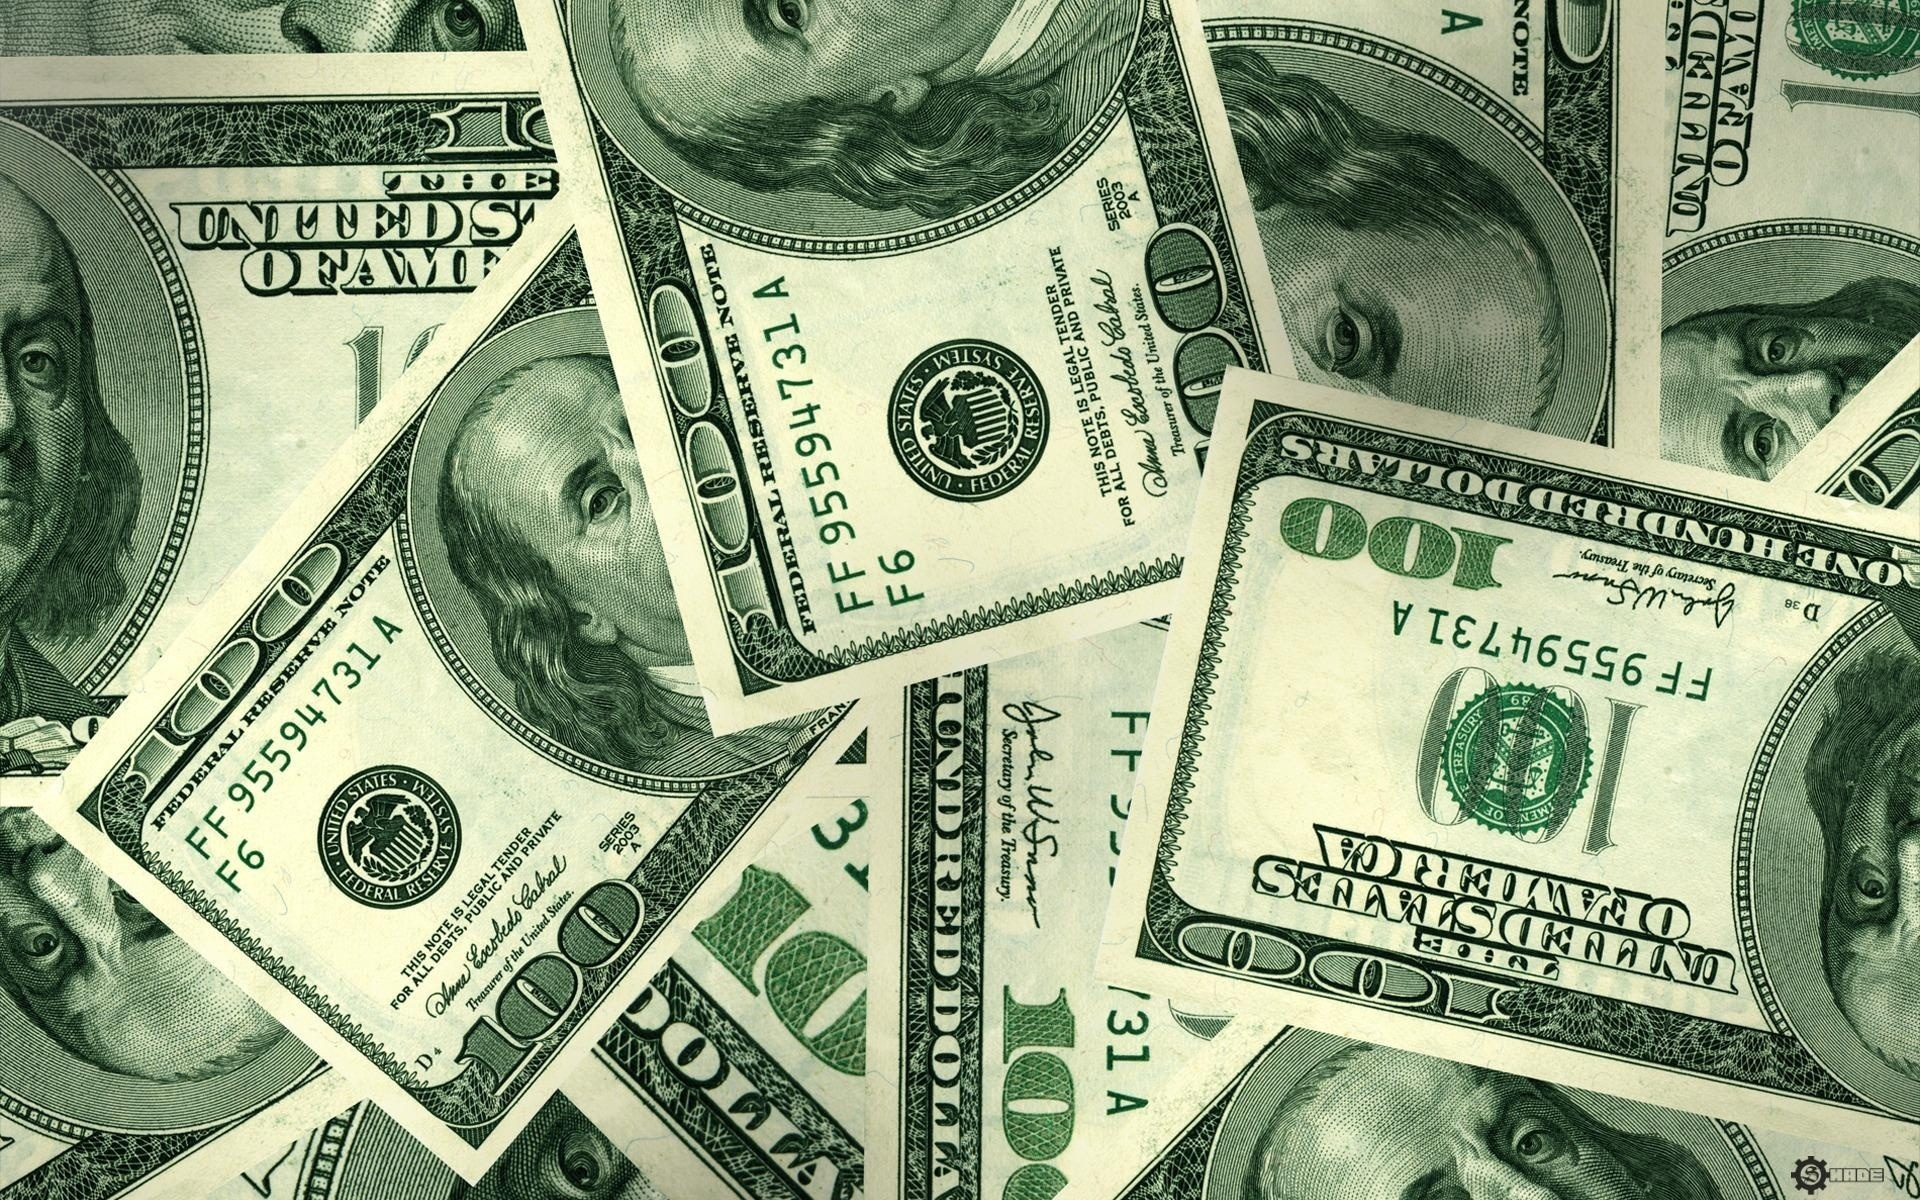 доллары, баксы, купюры